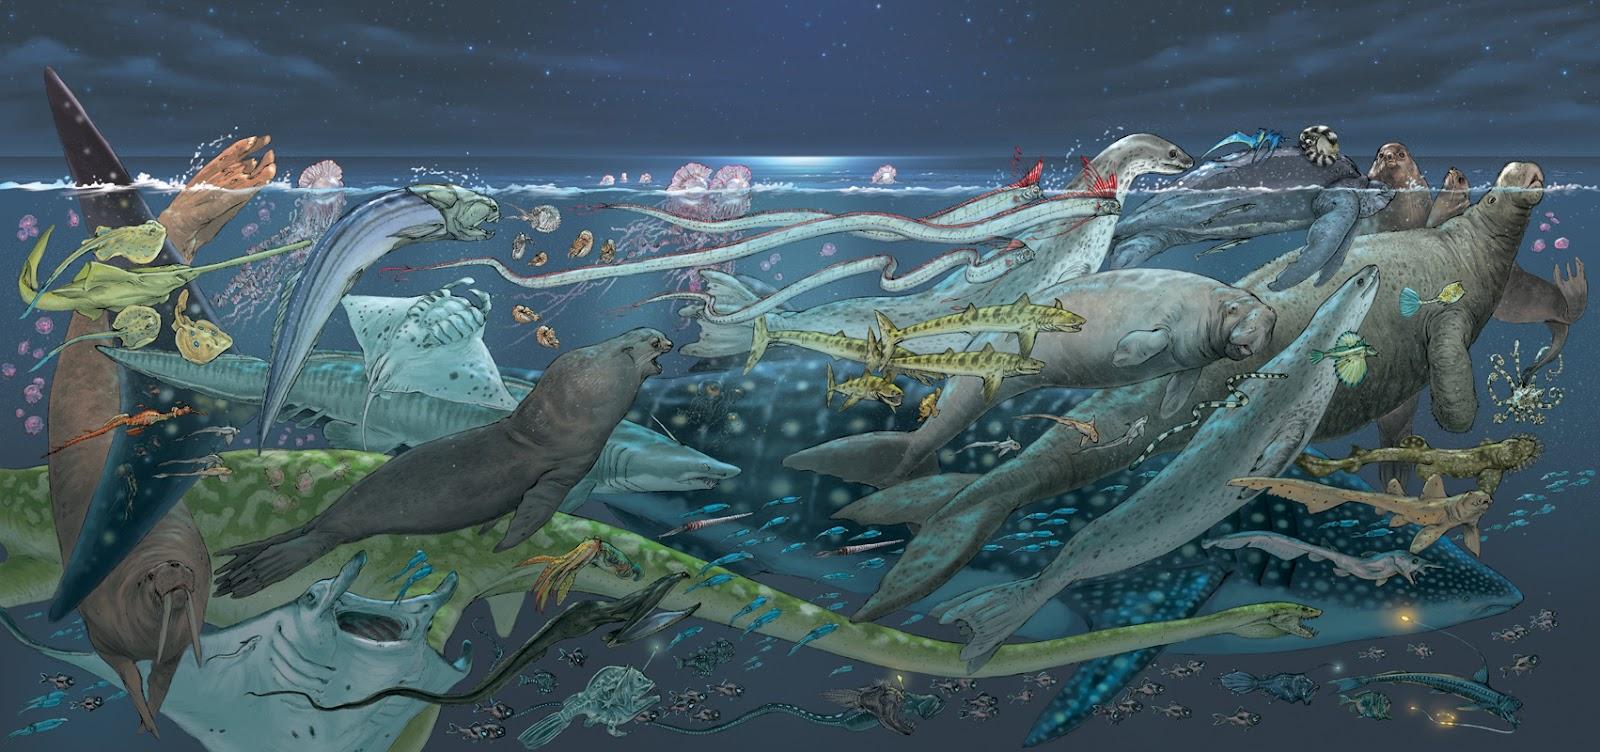 Paleo-Illustration Into Creature Design, A Natural Partnership